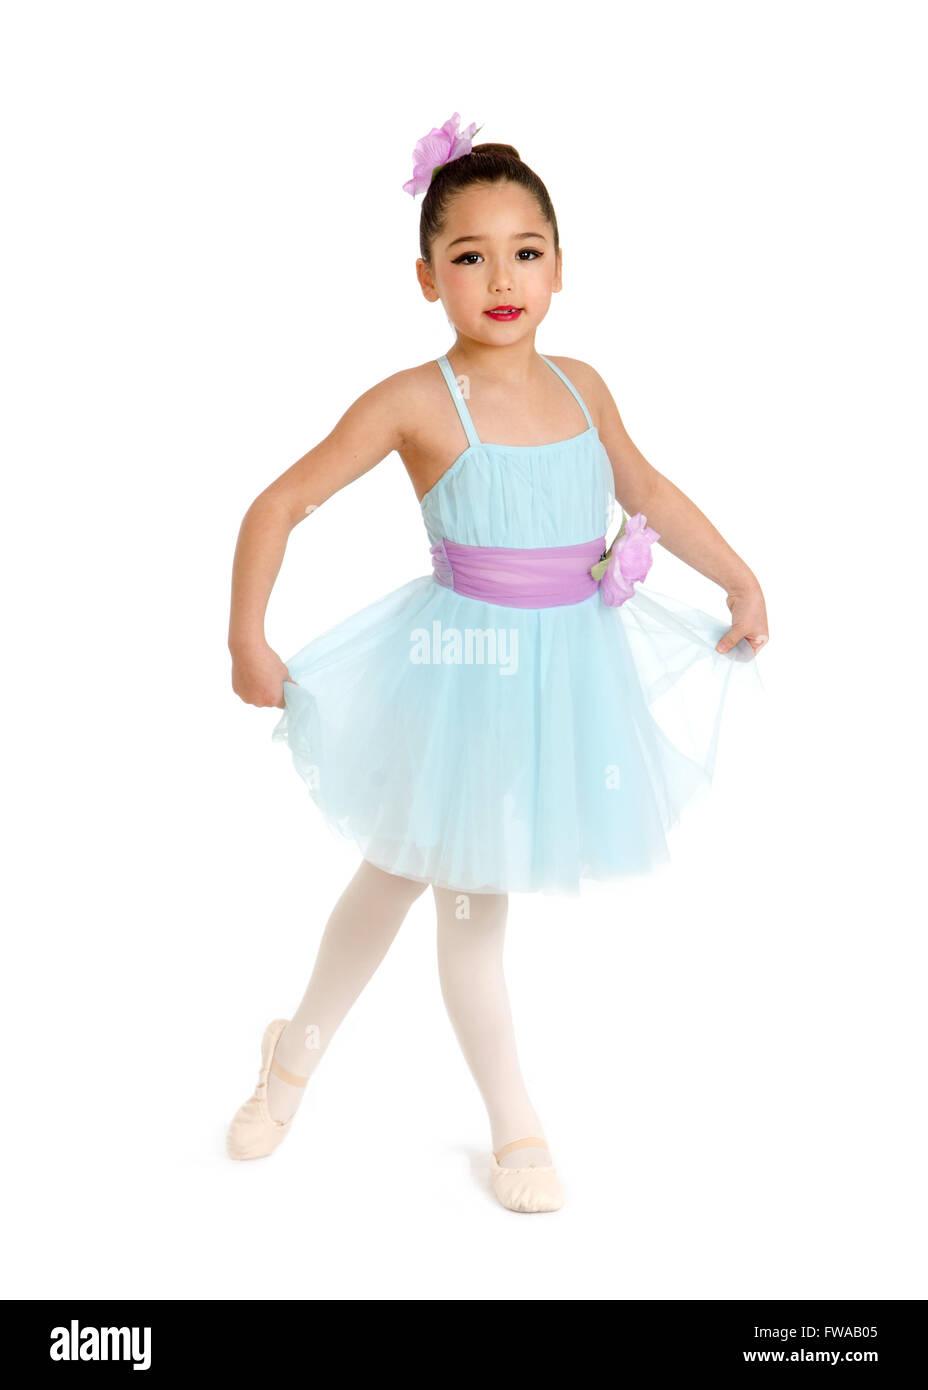 Child Ballet Dancer in pastel Recital Costume - Stock Image